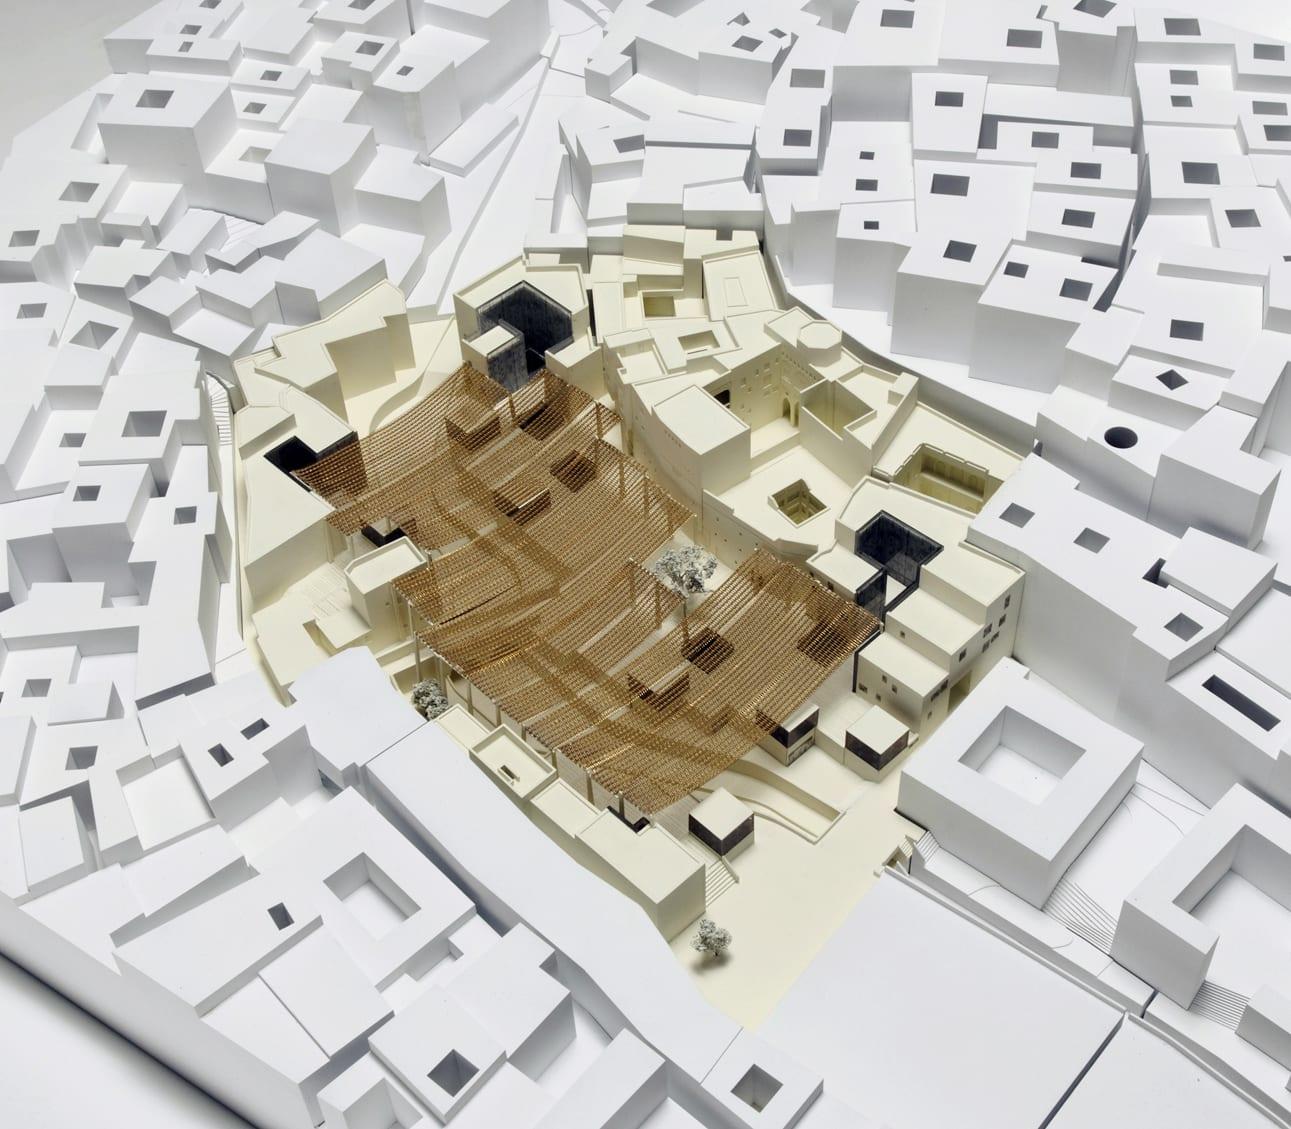 fes_model_5002_2_arquivio_arquitectura_taoufik_el_oufir_architectes